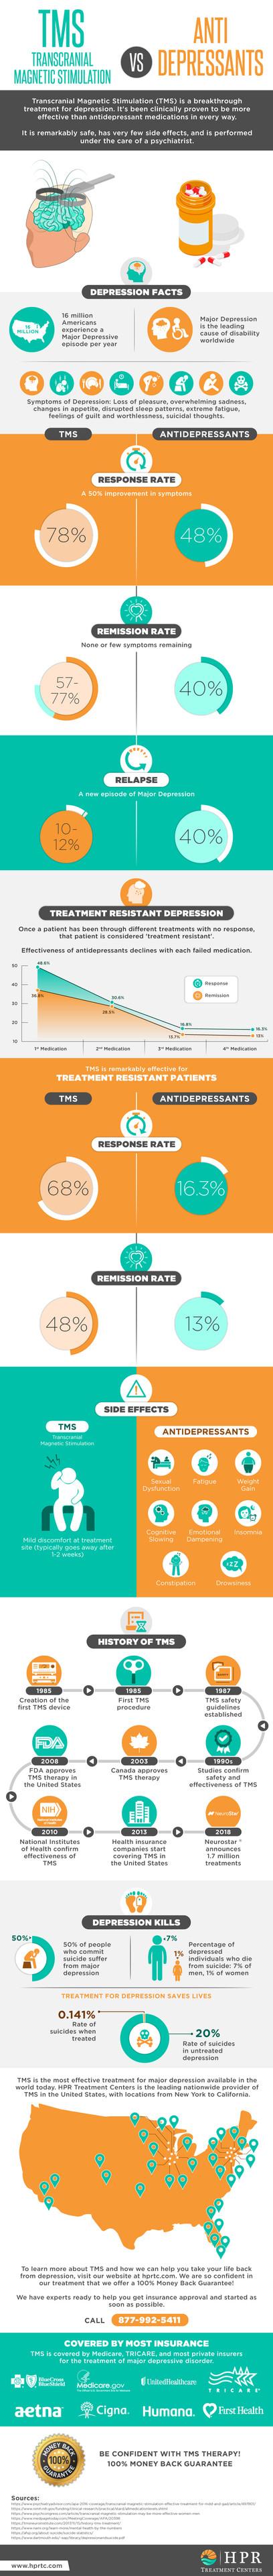 TMS Transcranial Magnetic Stimulation vs. Anti-Depressants